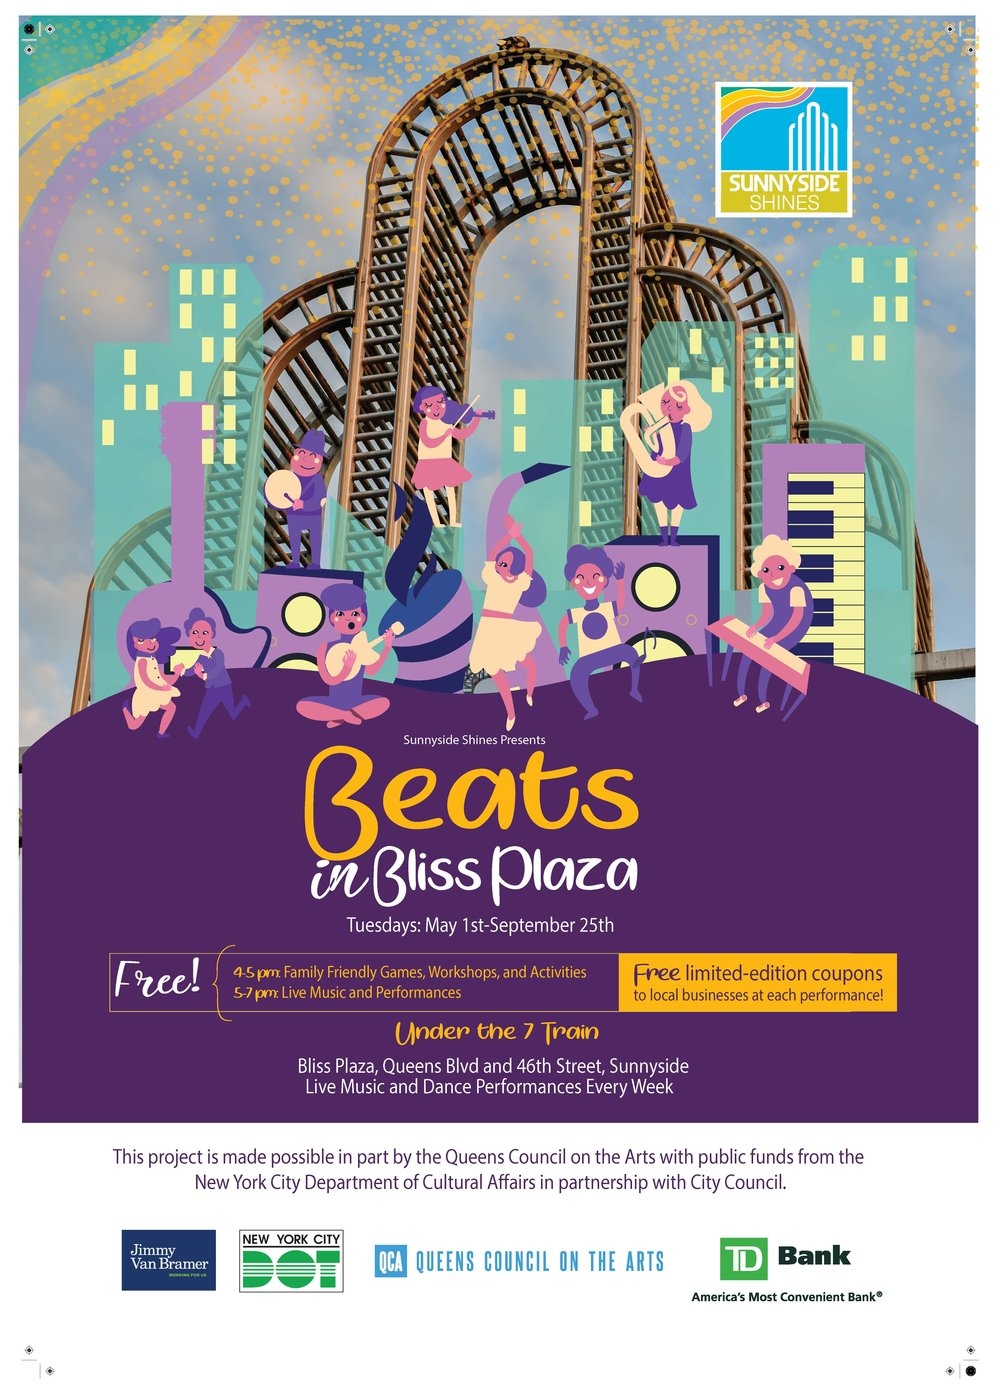 "Beats in Bliss - Poster 23"" x 33"".jpg"